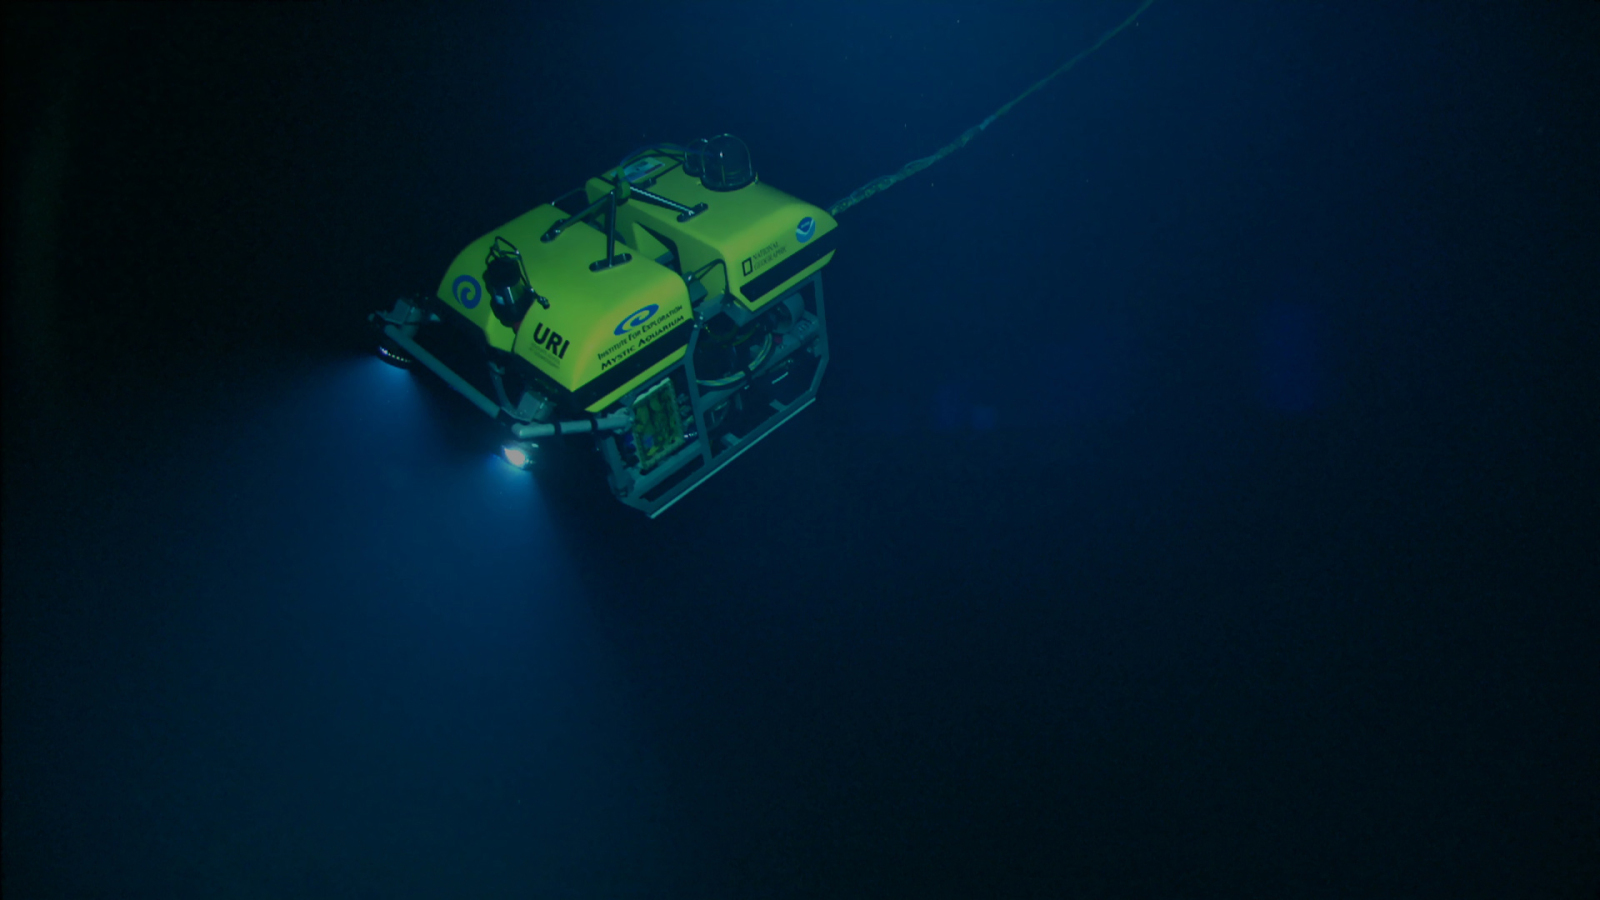 NOAA Okeanos Explorer Program, deep sea sub